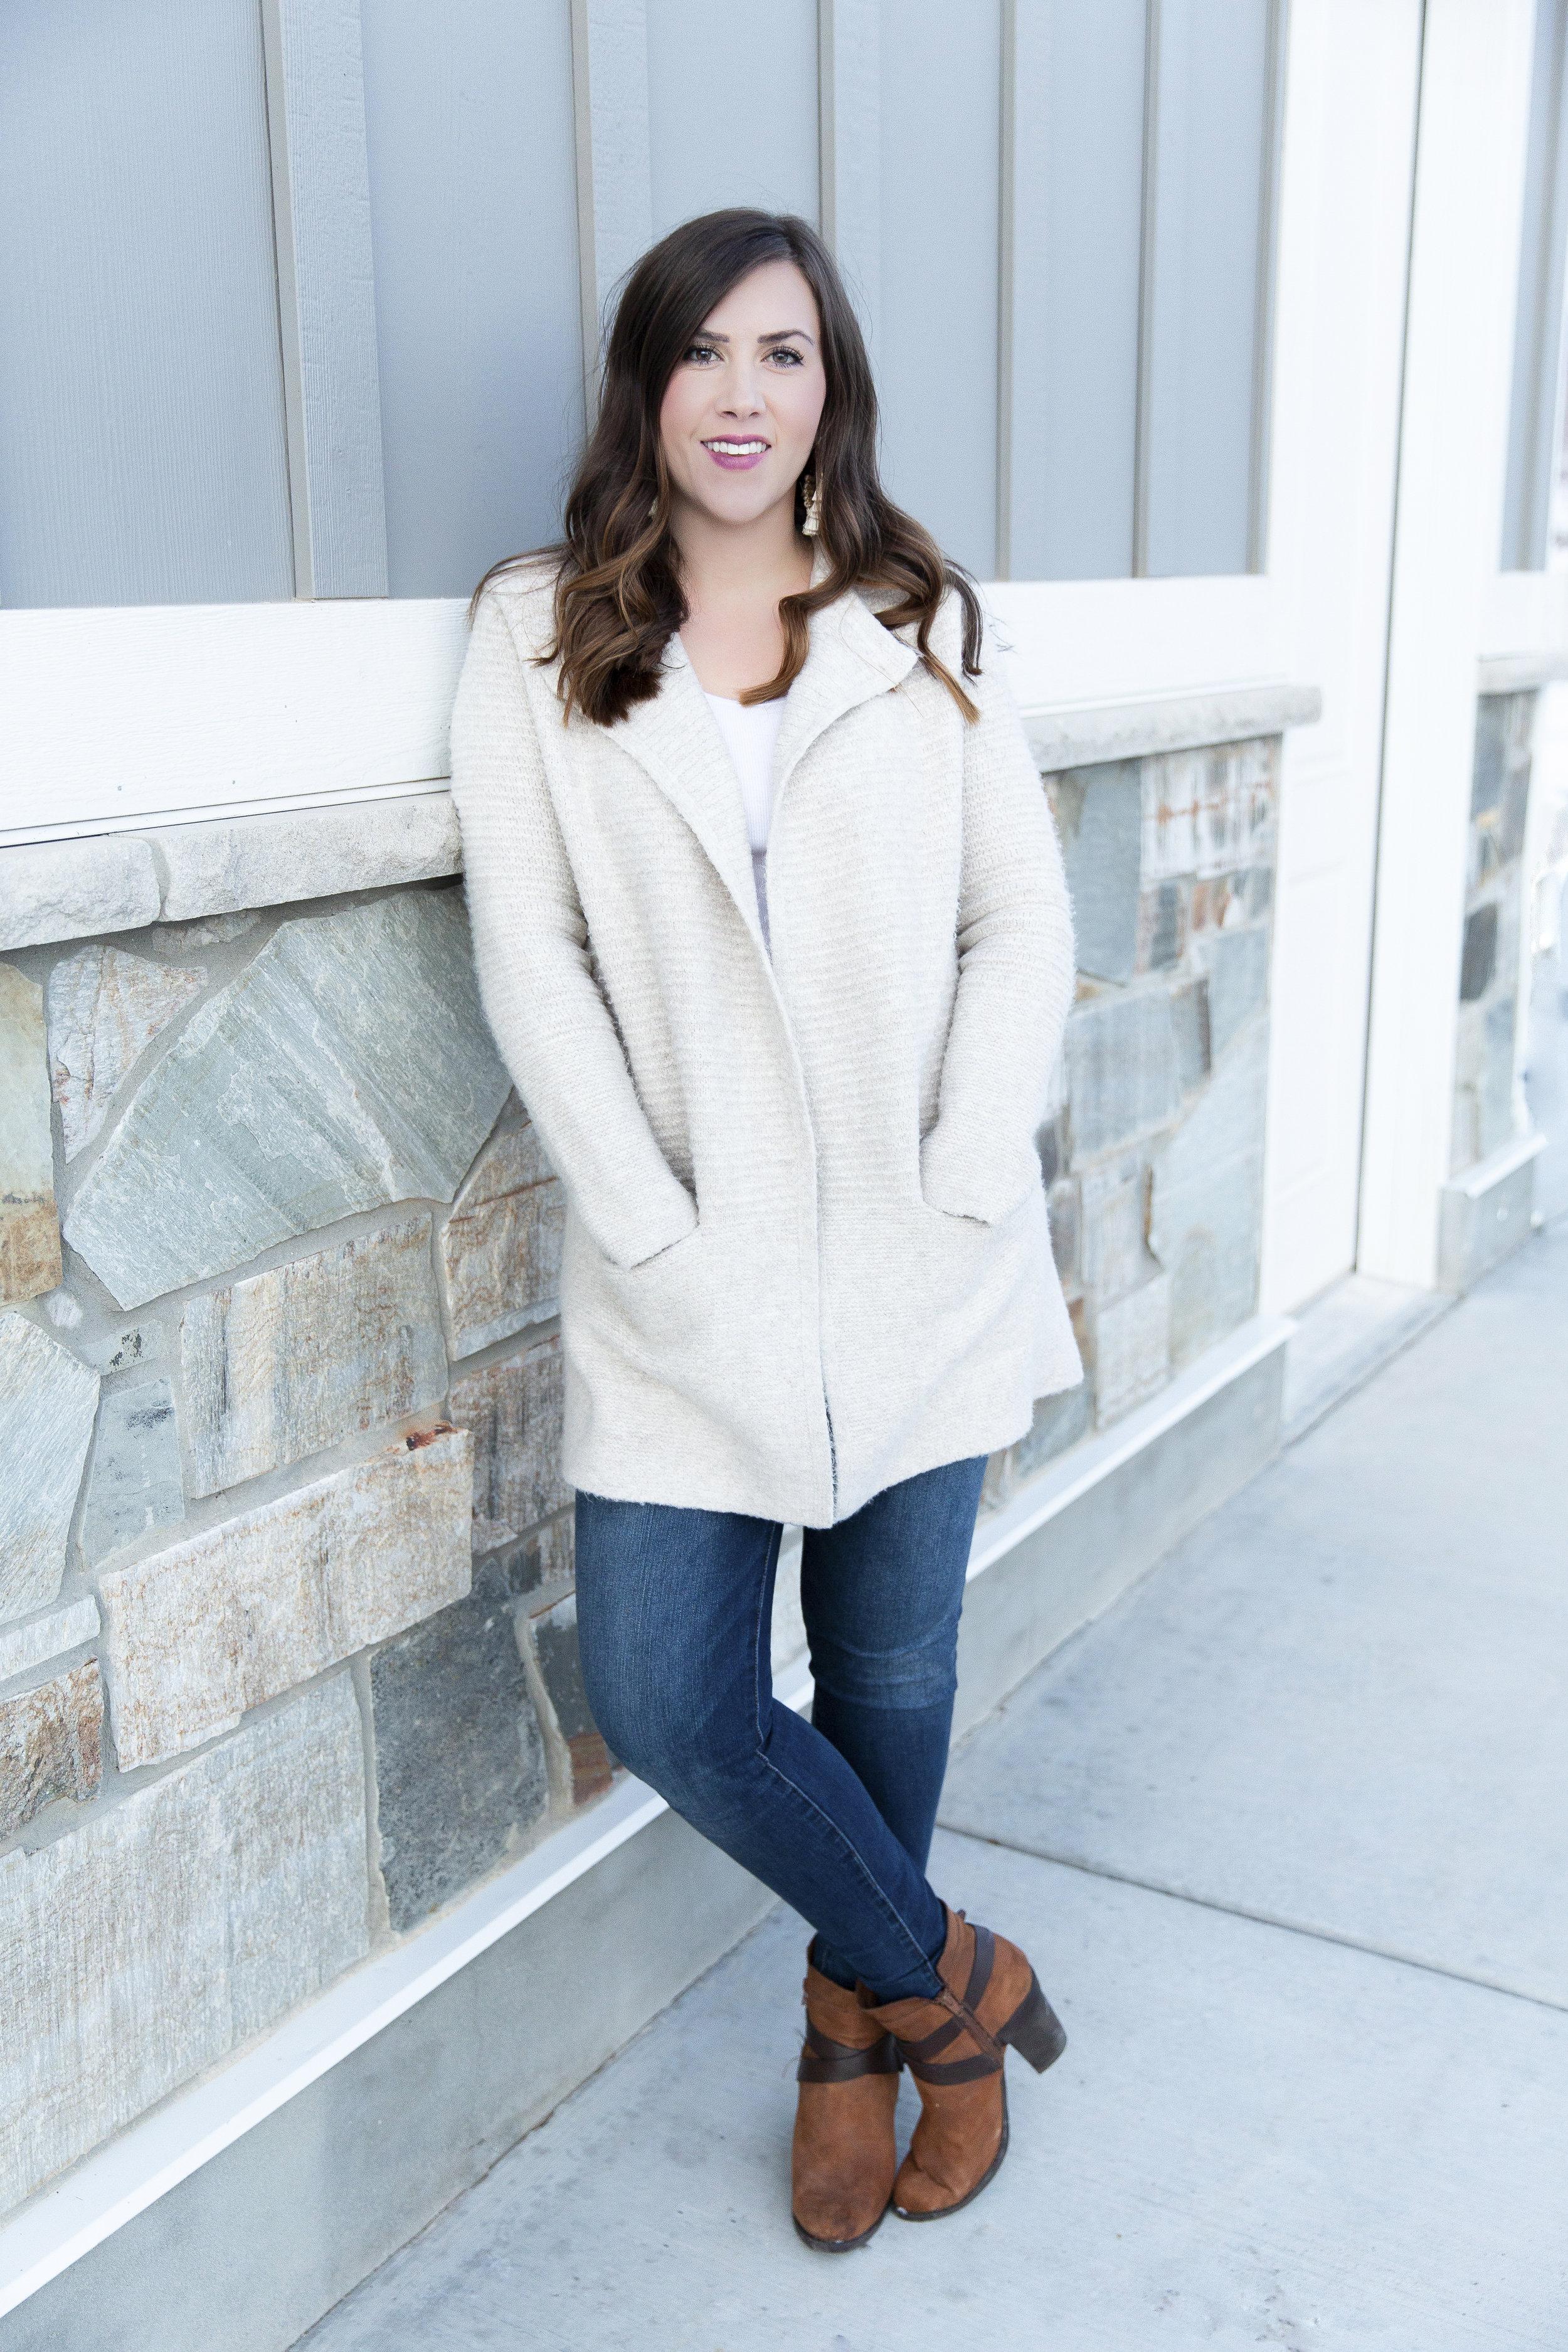 Whitney Filimoeatu - Principal